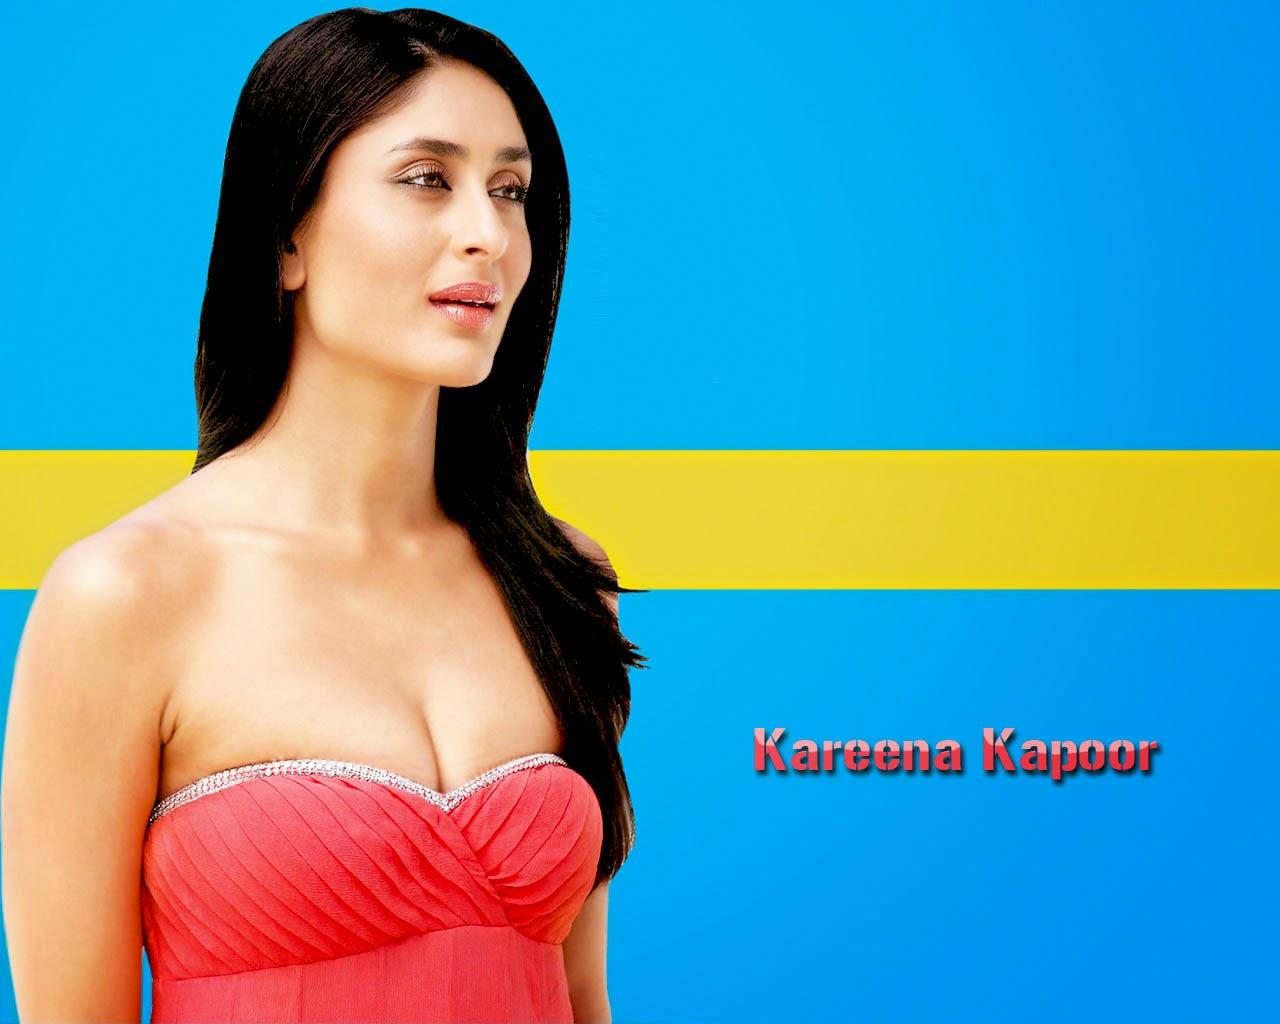 Bollywood Actress Karenna Kapoor Full Hd Wallpaper Hot -4227